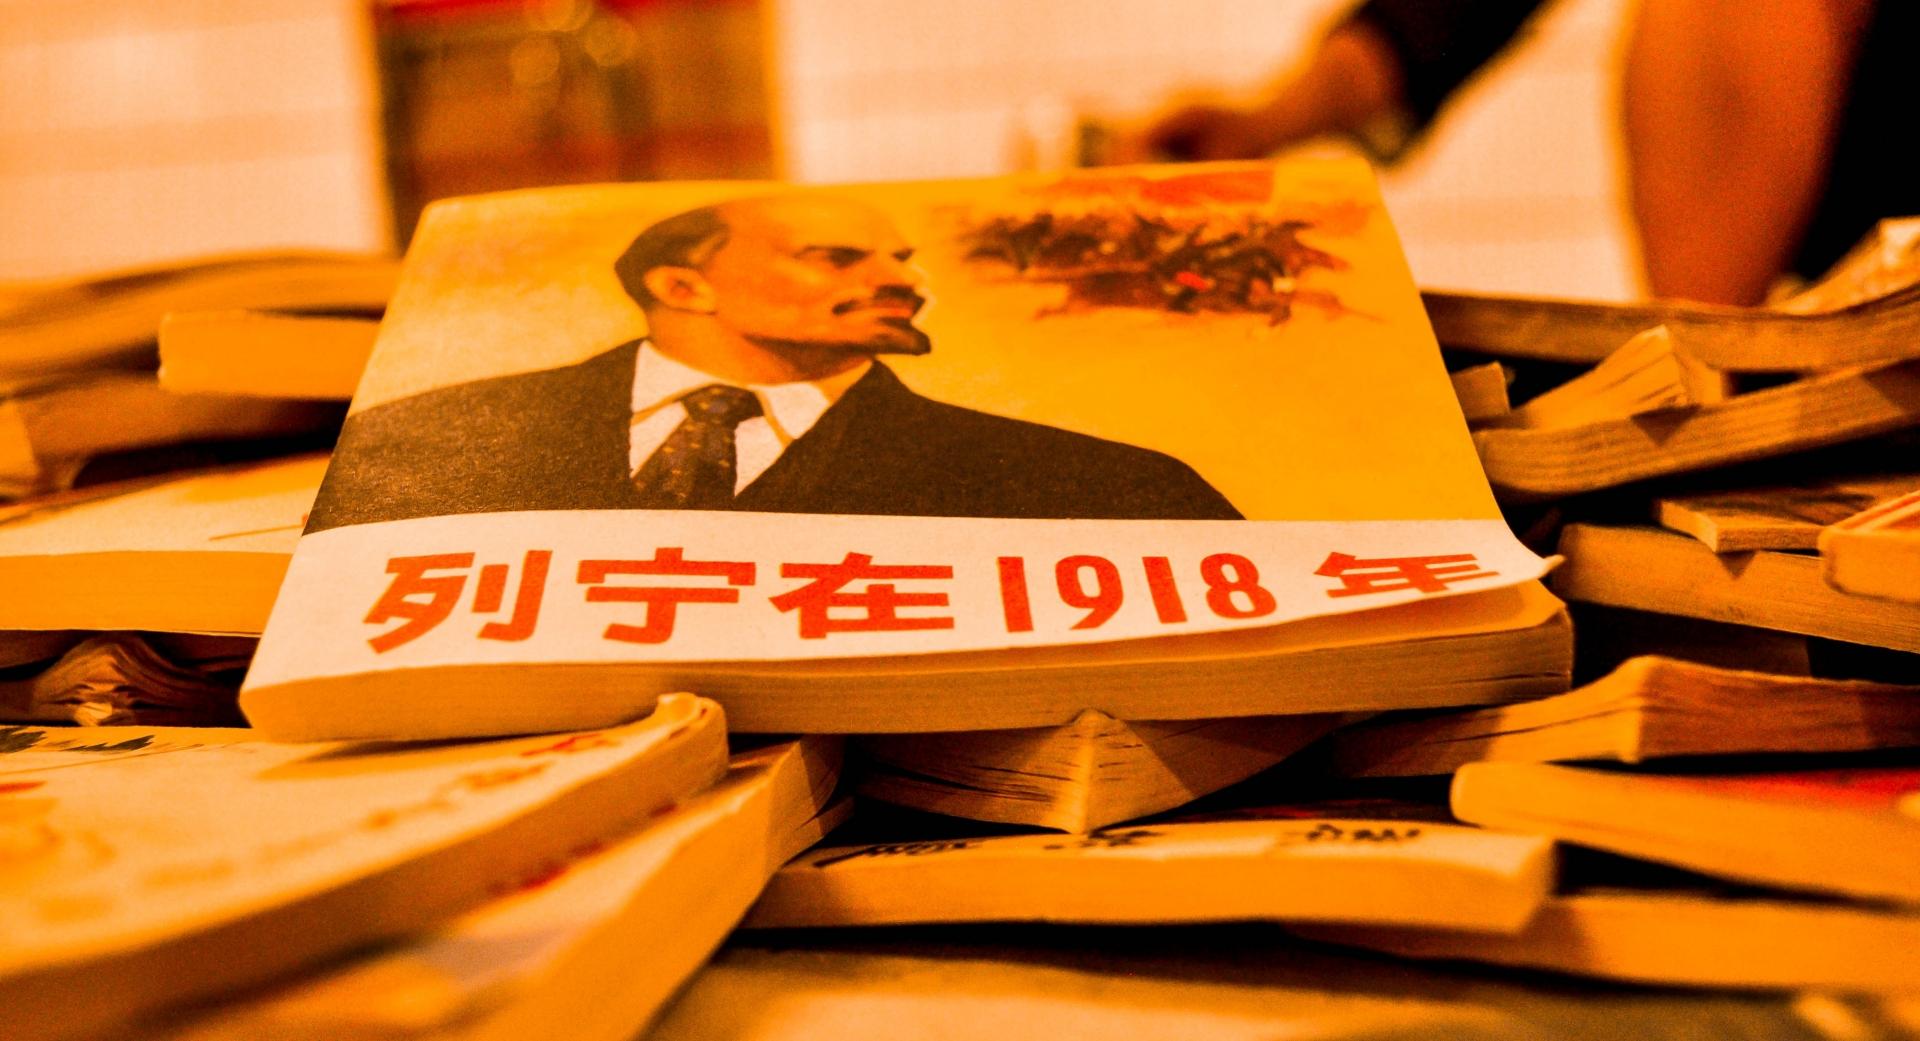 Книги. Китай